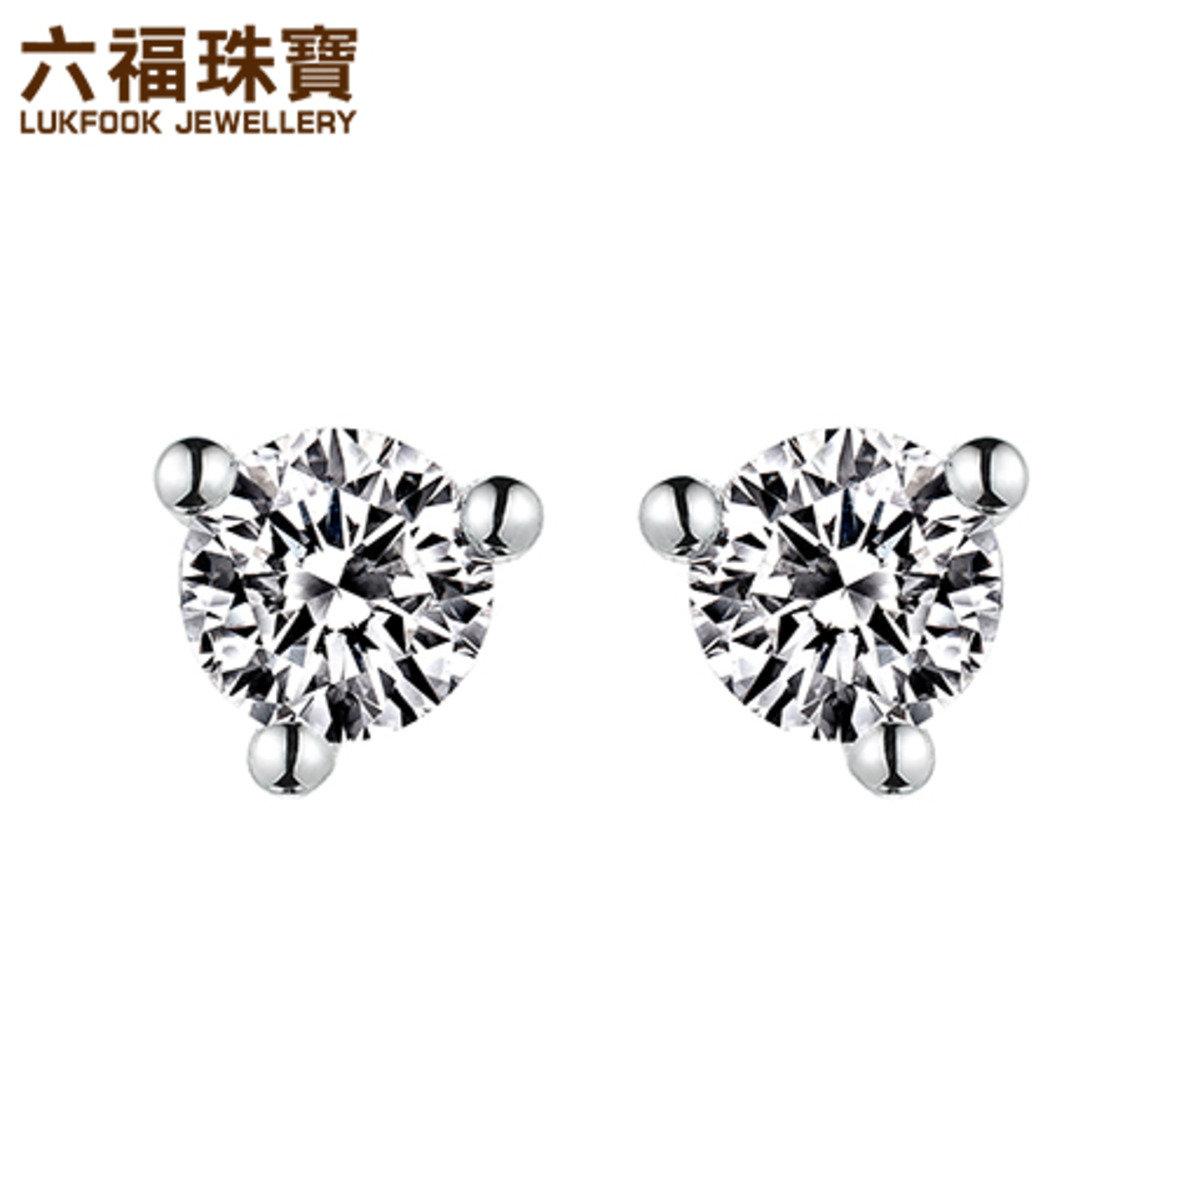 18K/750金(白色)鑲單鑽石耳環